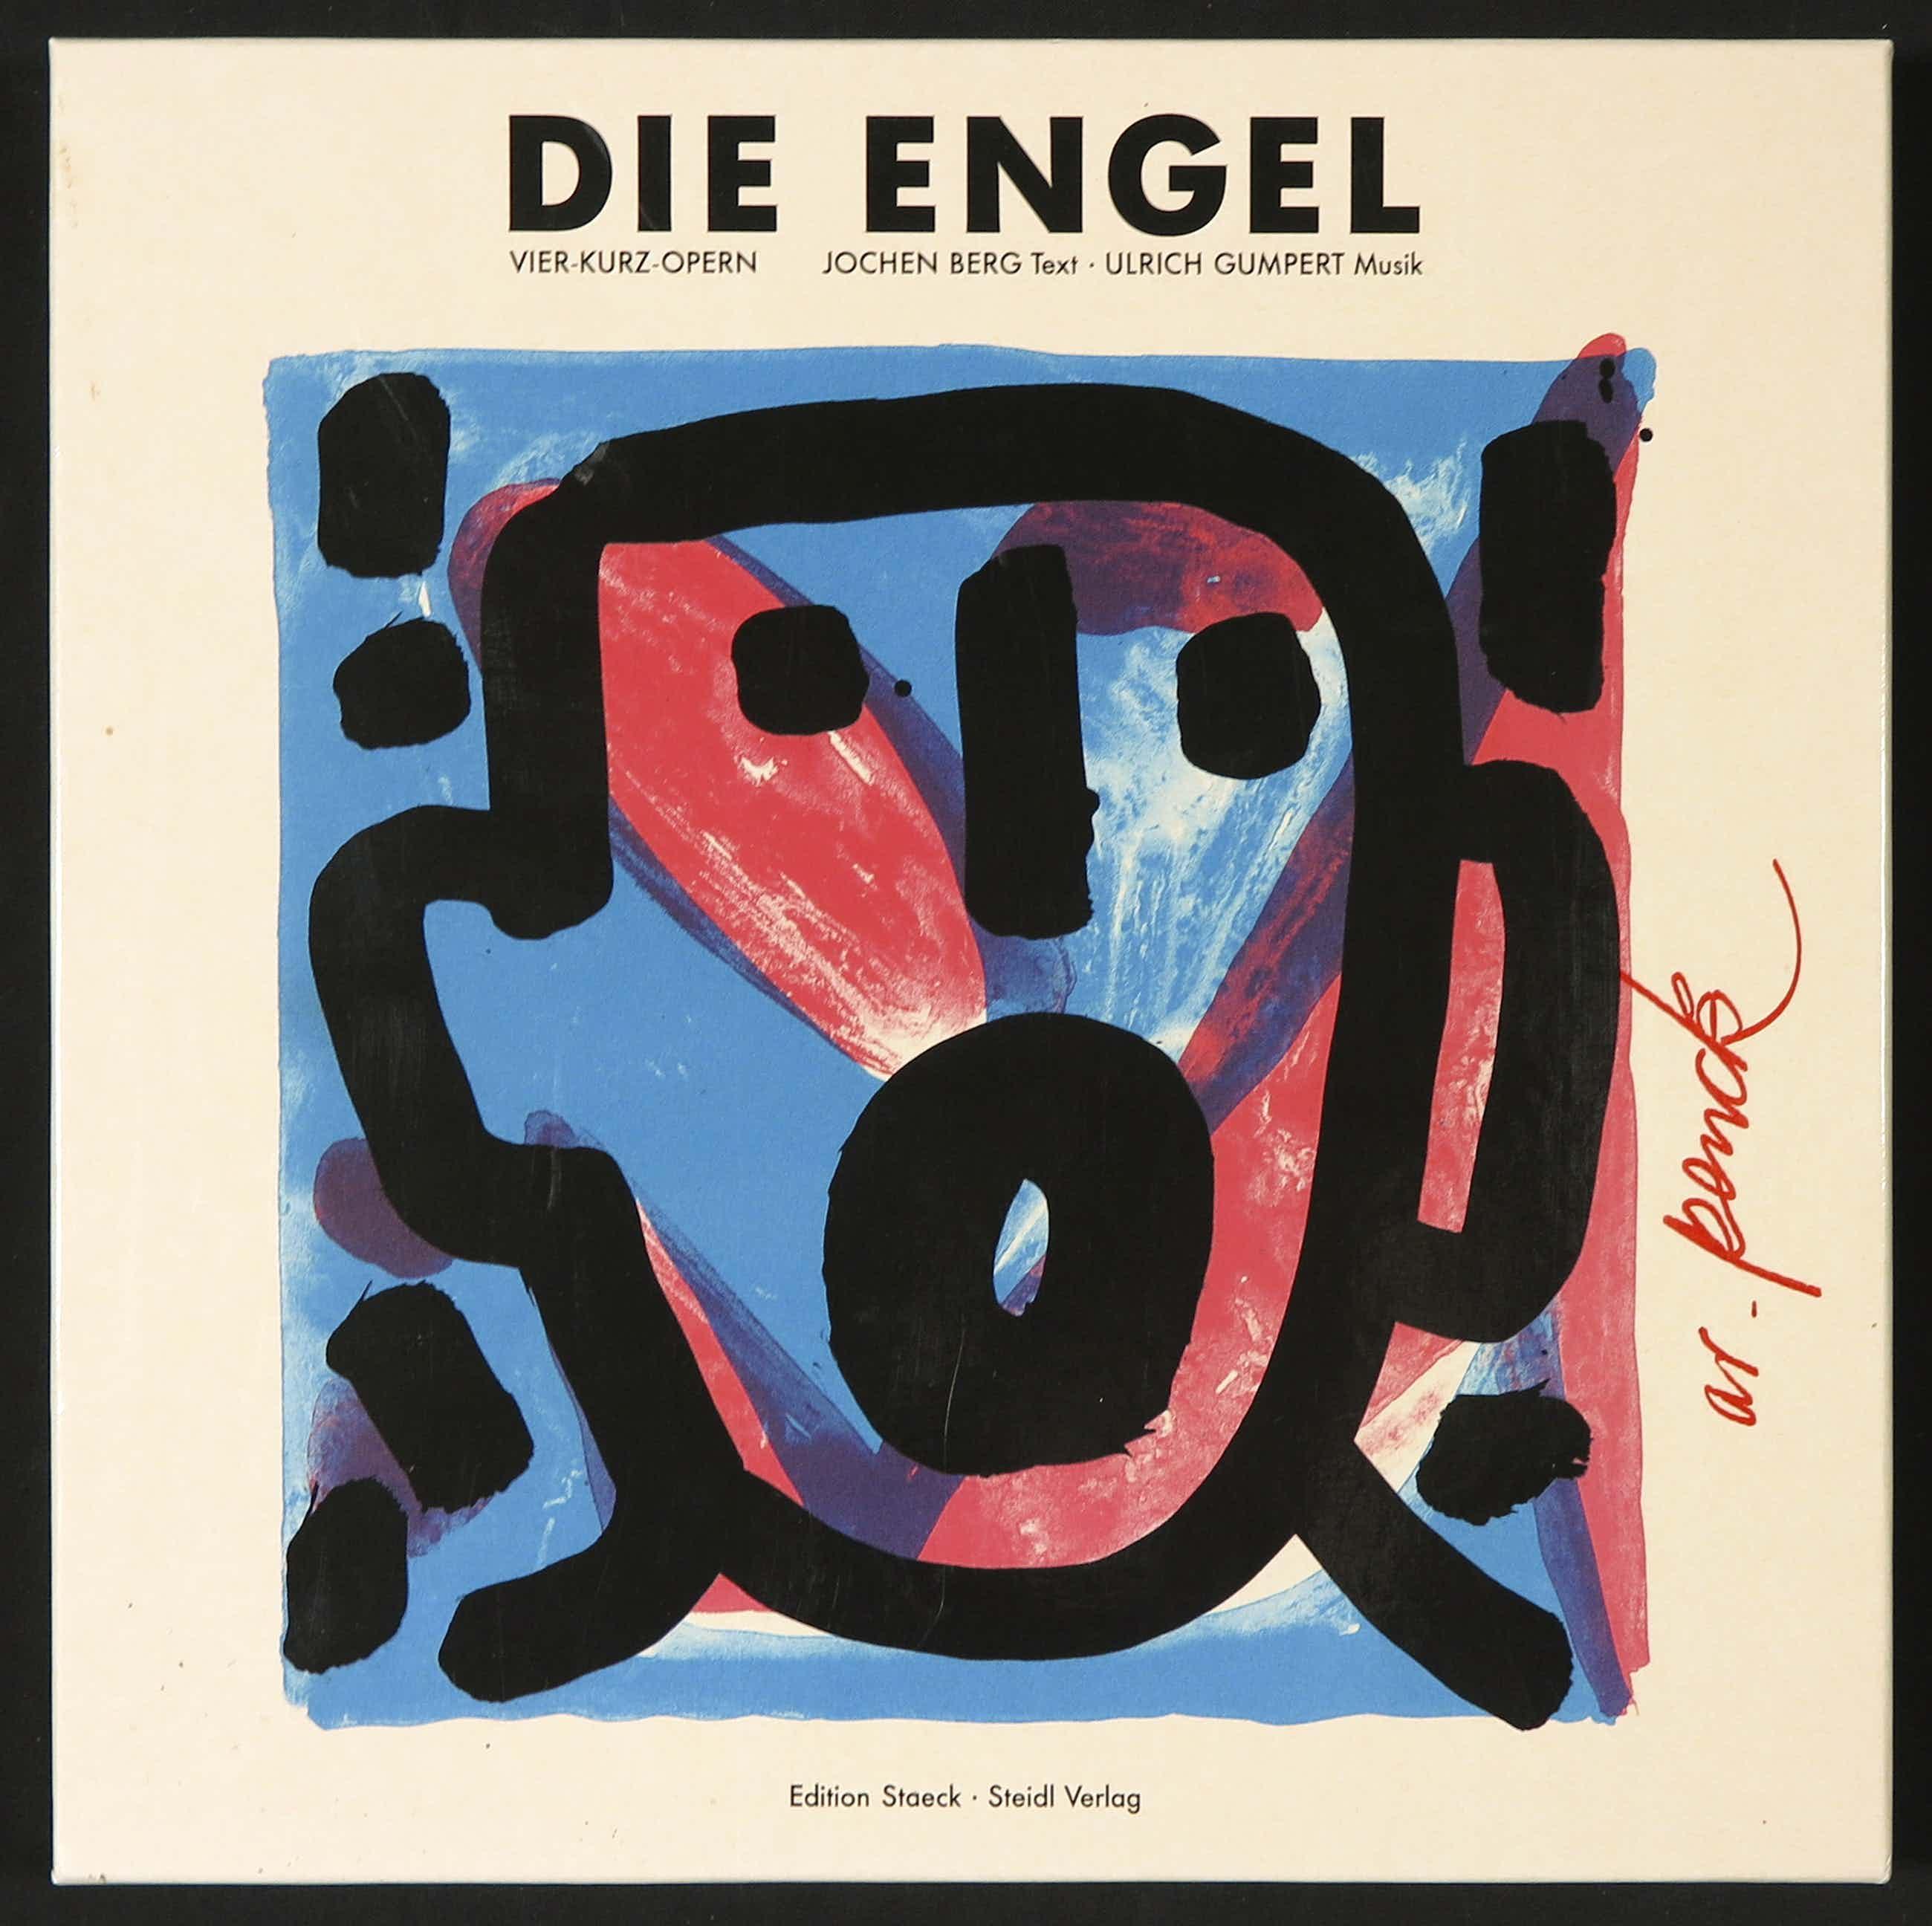 A.R. Penck - Ulrich Gumpert - Jochen Berg: 2CD Box - Gesigneerd: Die Engel kopen? Bied vanaf 85!